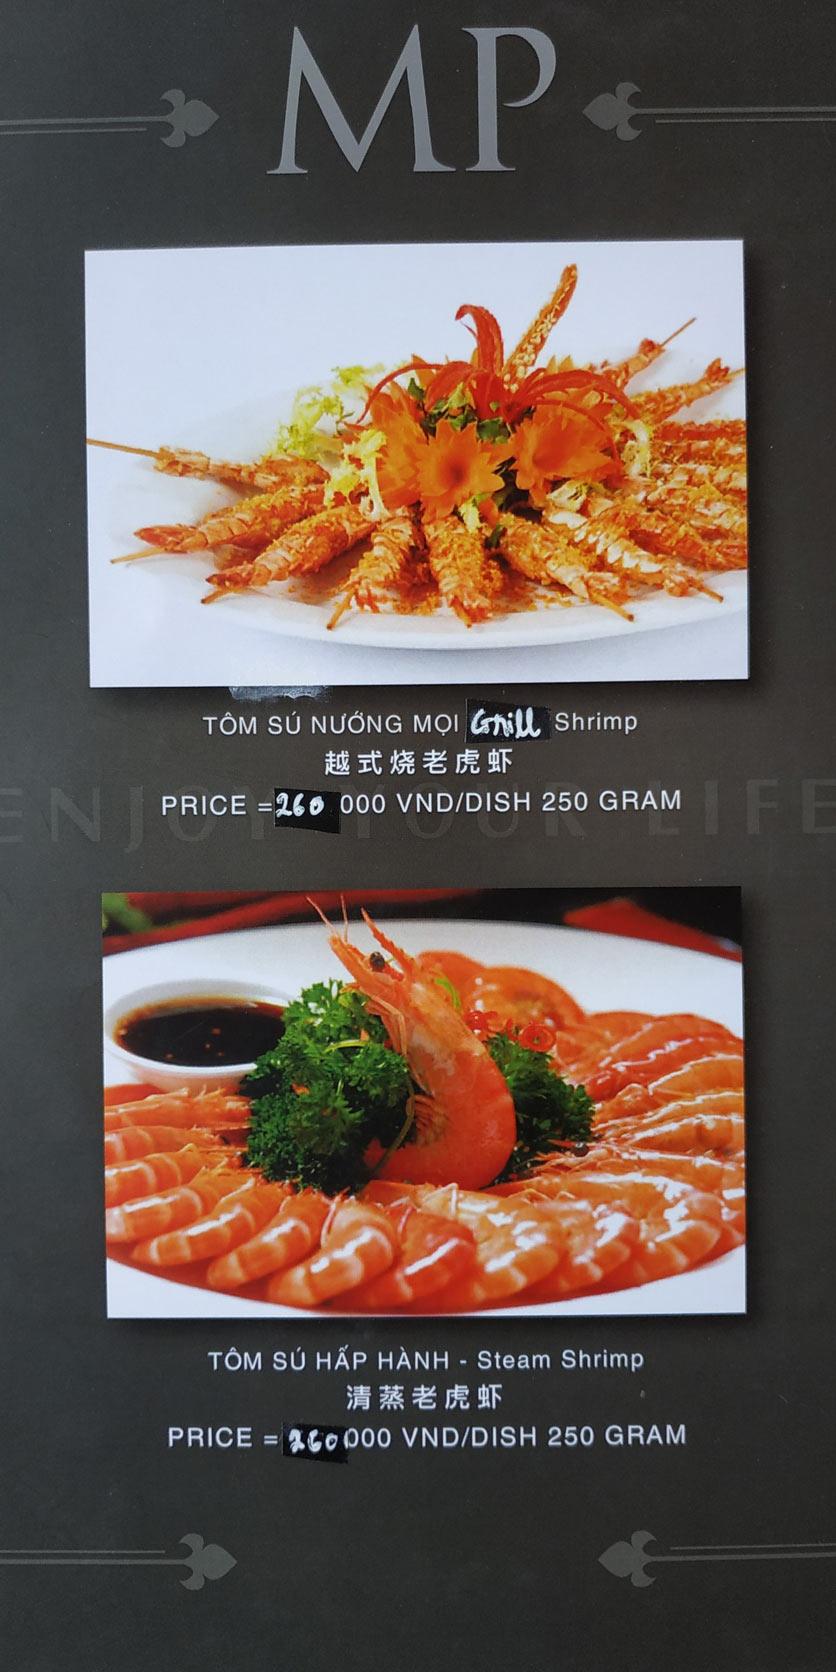 Menu MP Thai Seafood Restaurant - Phạm Văn Đồng 12